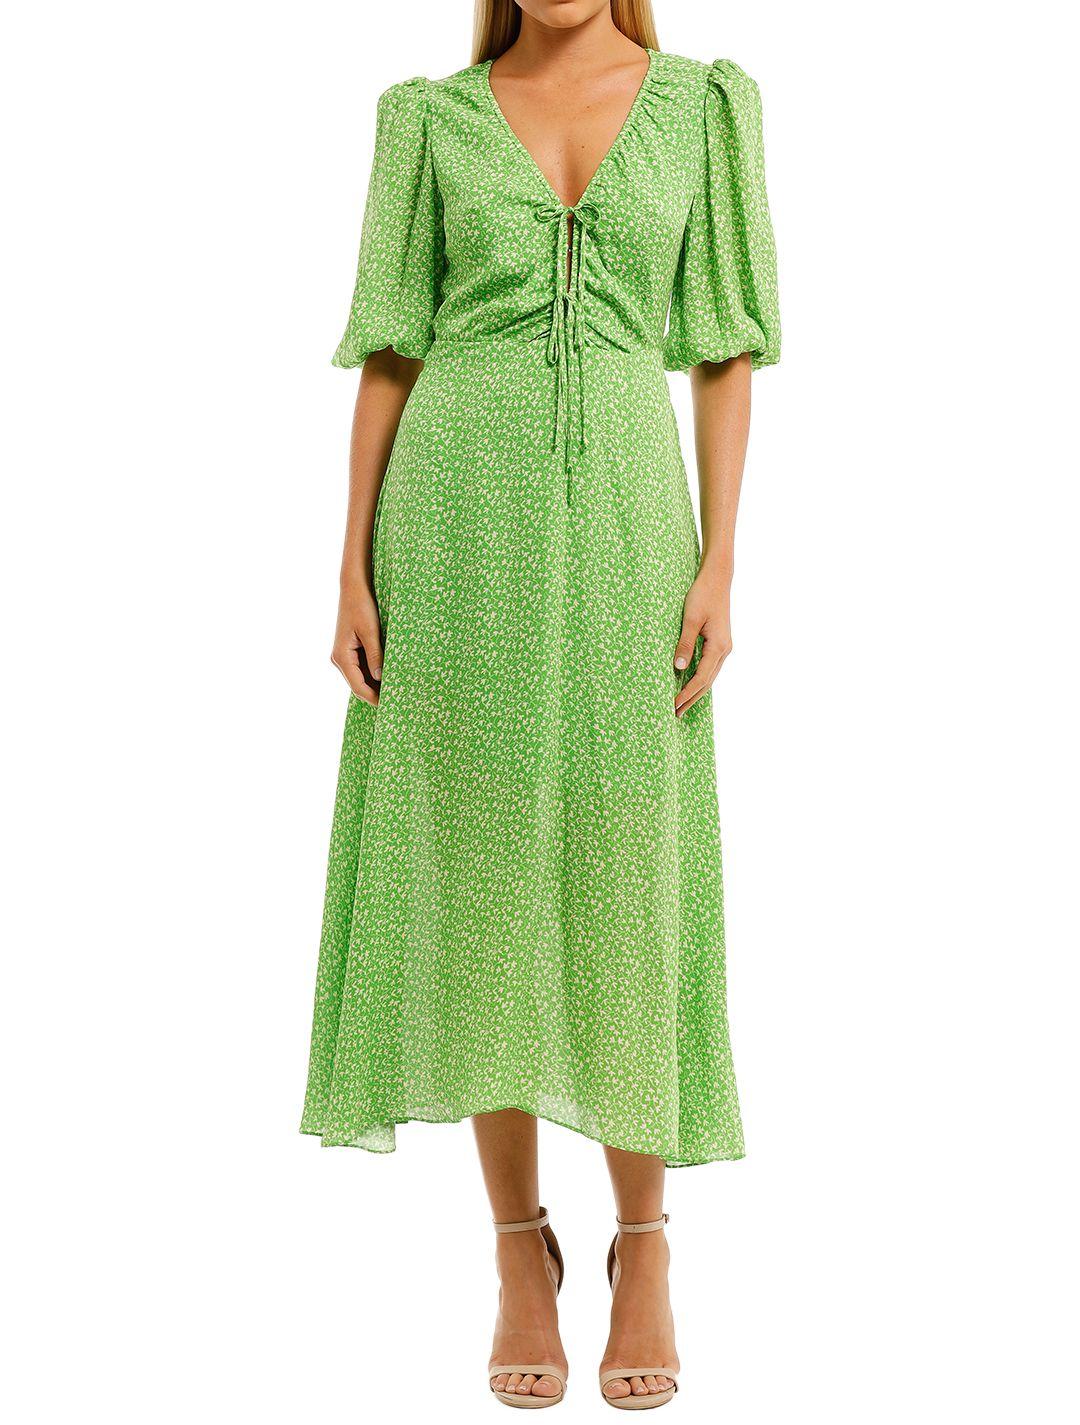 Nicholas-Danielle-Dress-Green-Front